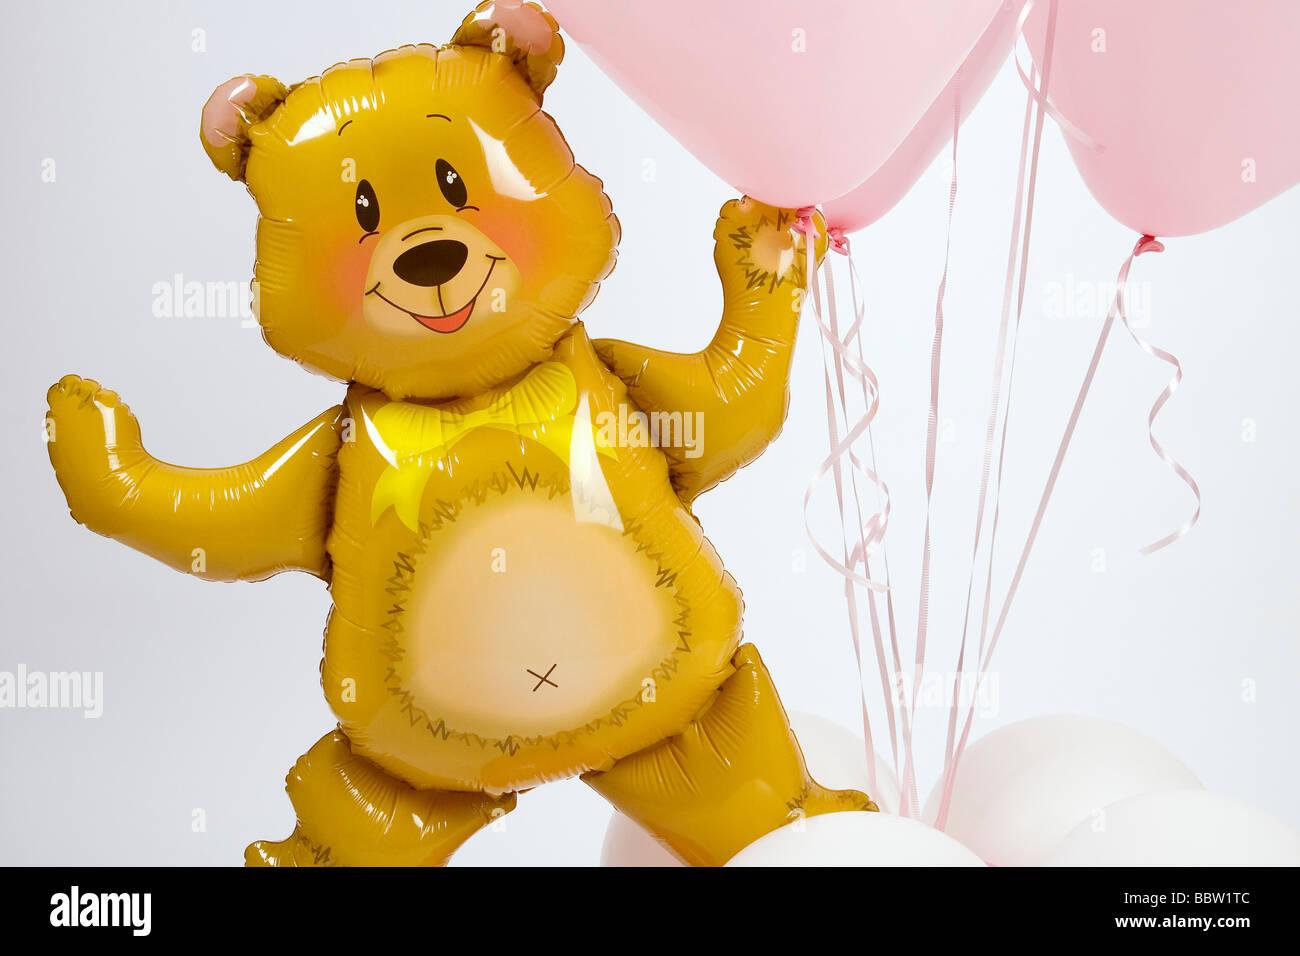 Globos para Fiestas y Regalos Balloons for Parties and Gifts - Stock Image